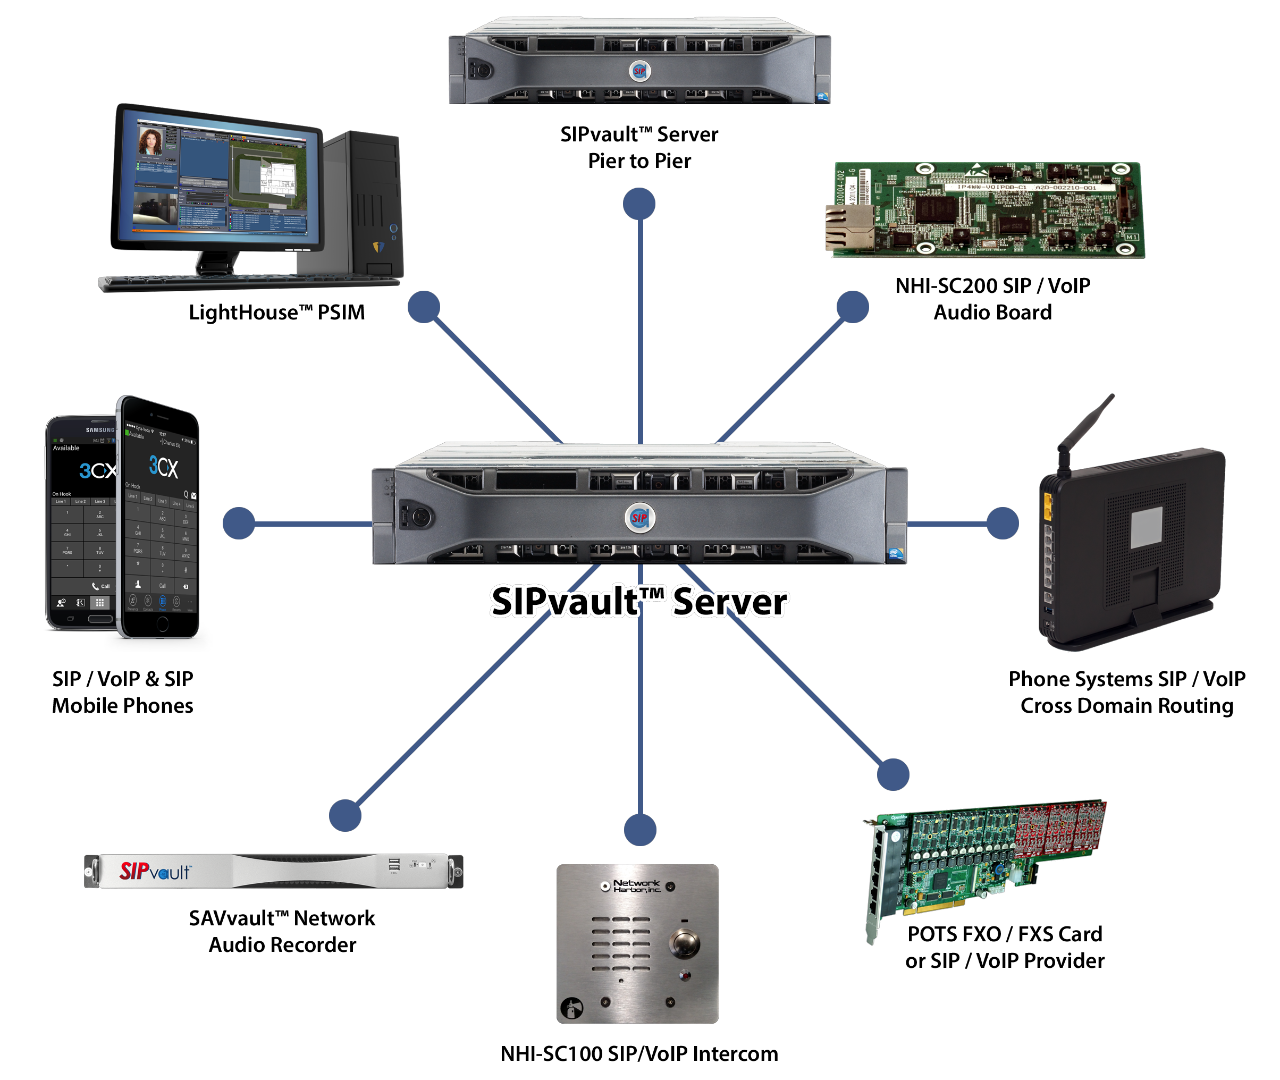 Intercom systems, SIP audio management server - Network Harbor